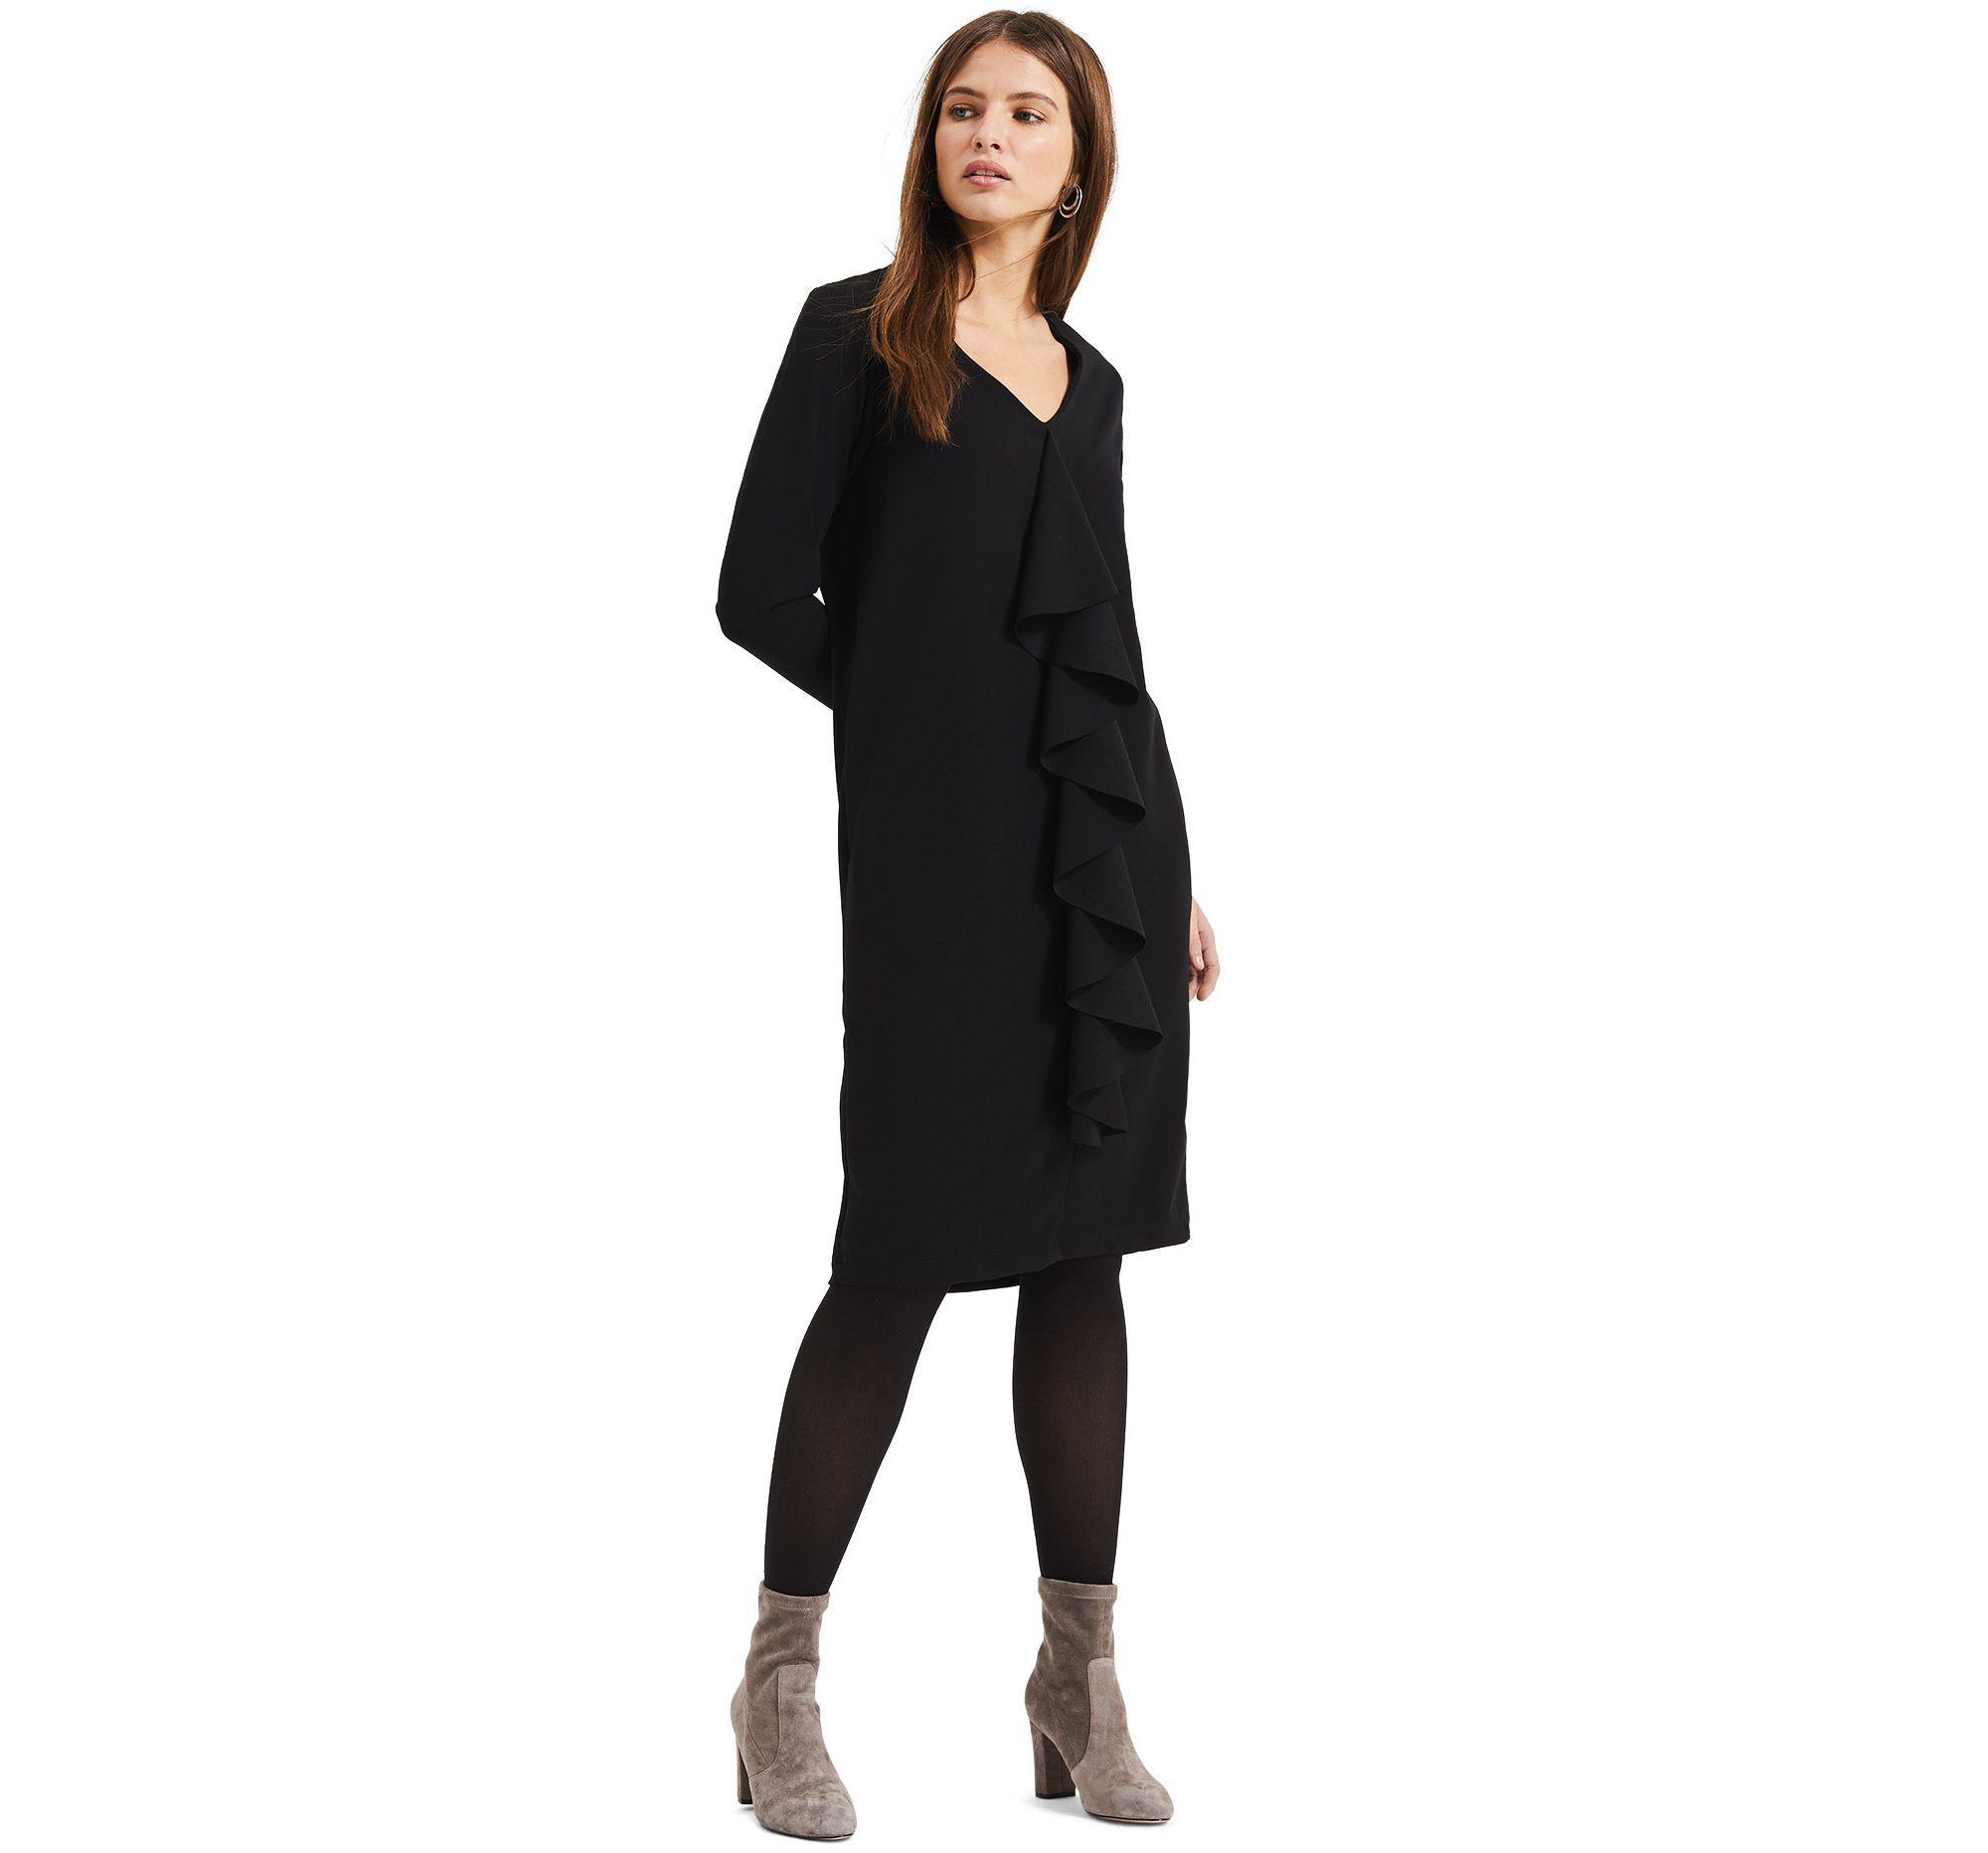 7463d84735 Phase Eight Black Massy Centre Ruffle Dress in Black - Lyst